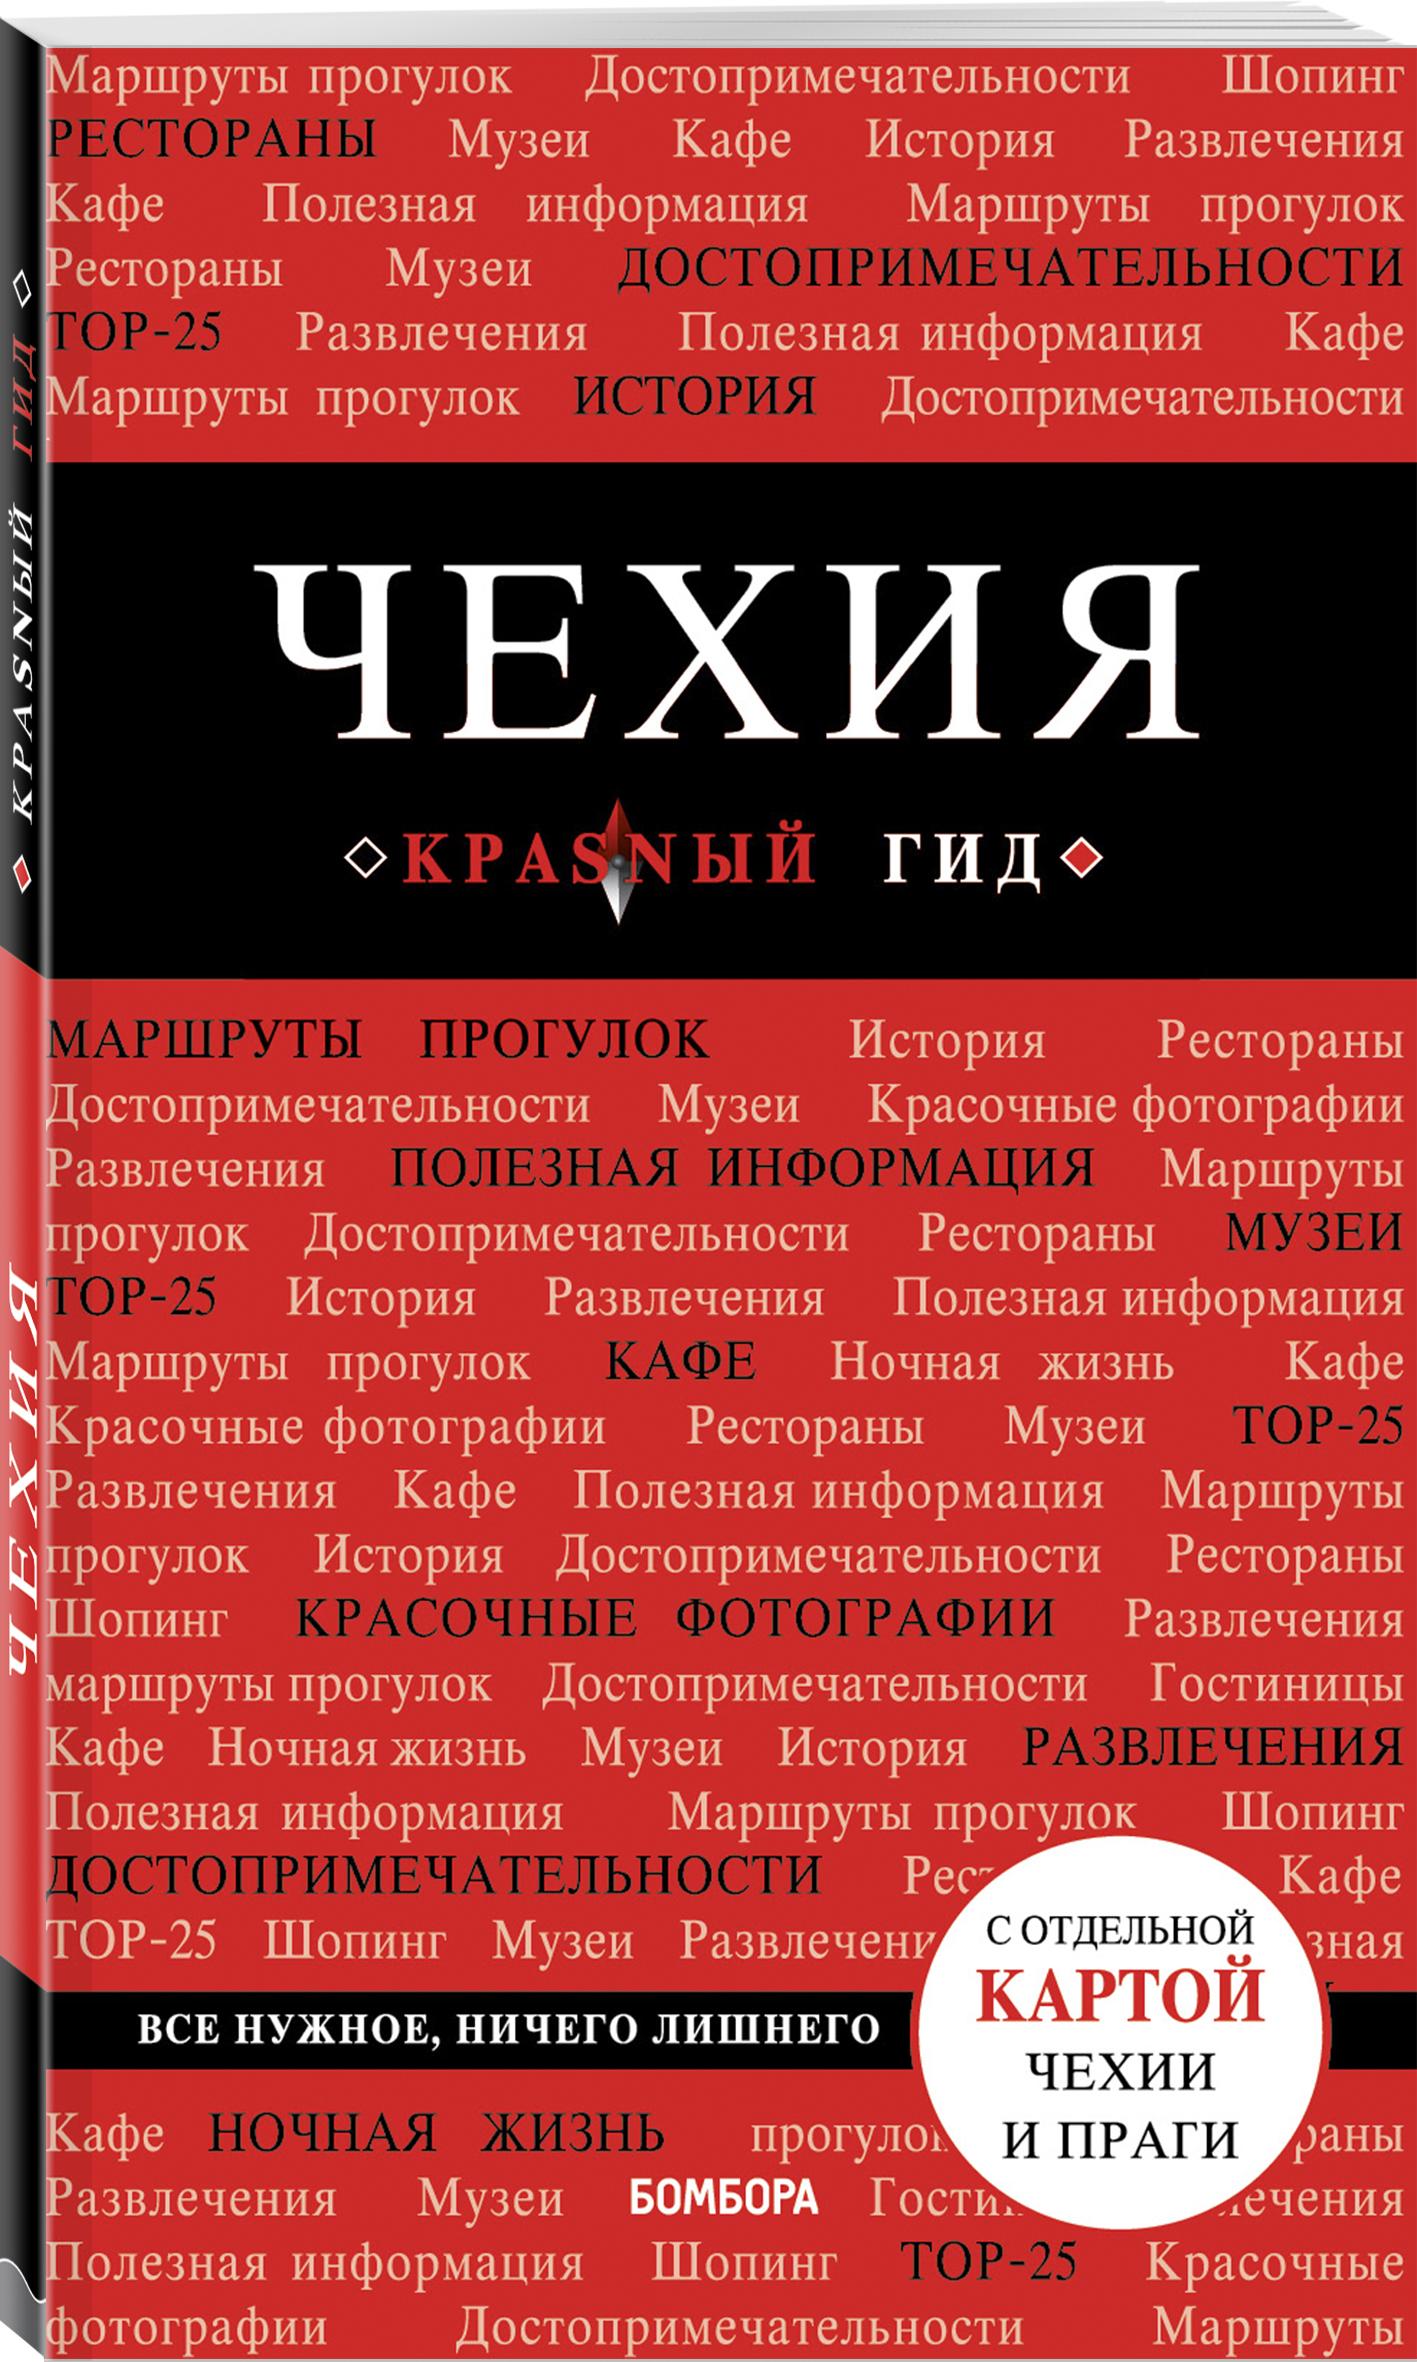 Яровинская Т. Чехия. 3-е изд.